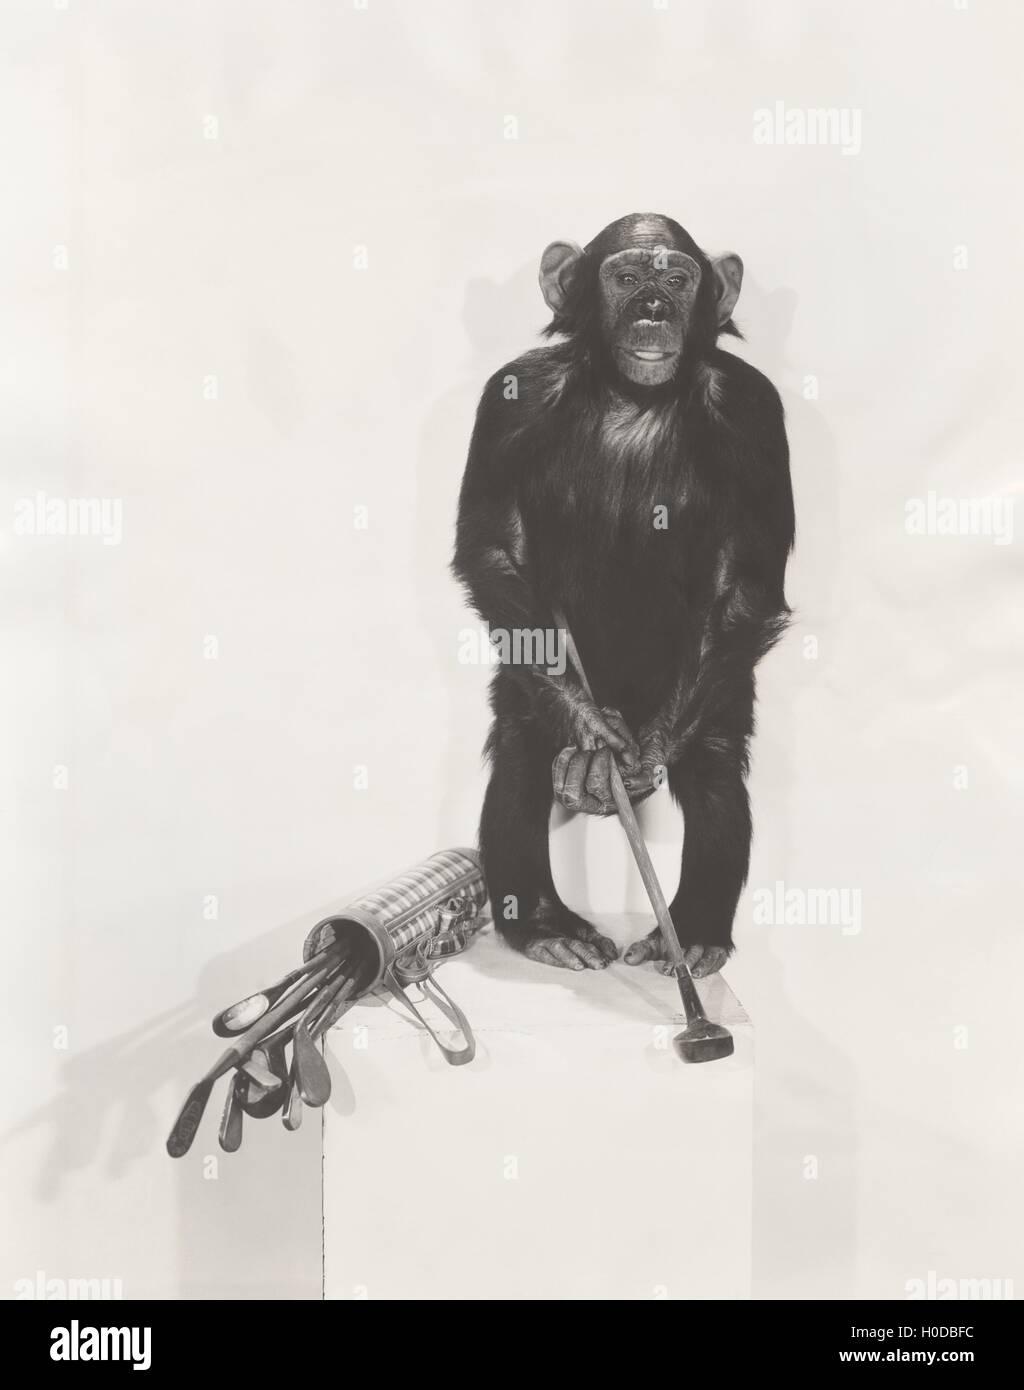 Monkey holding a golf club - Stock Image